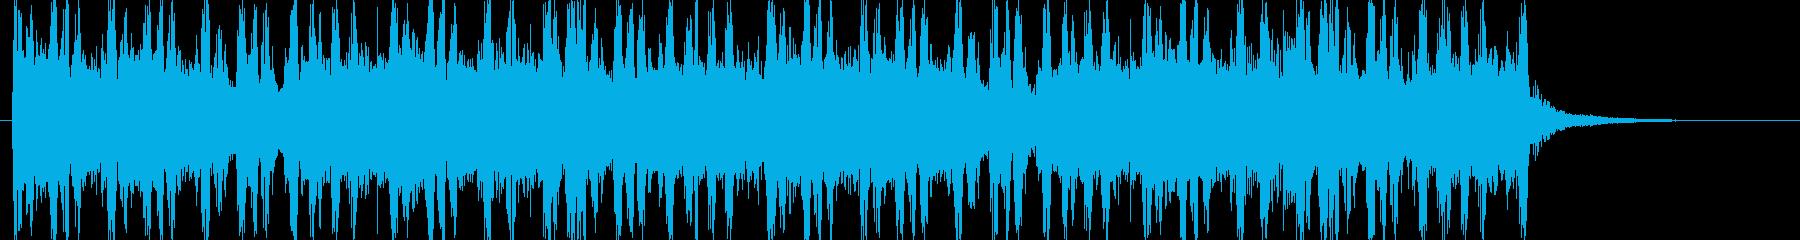 OP ED ノリノリなドラムパターンの再生済みの波形